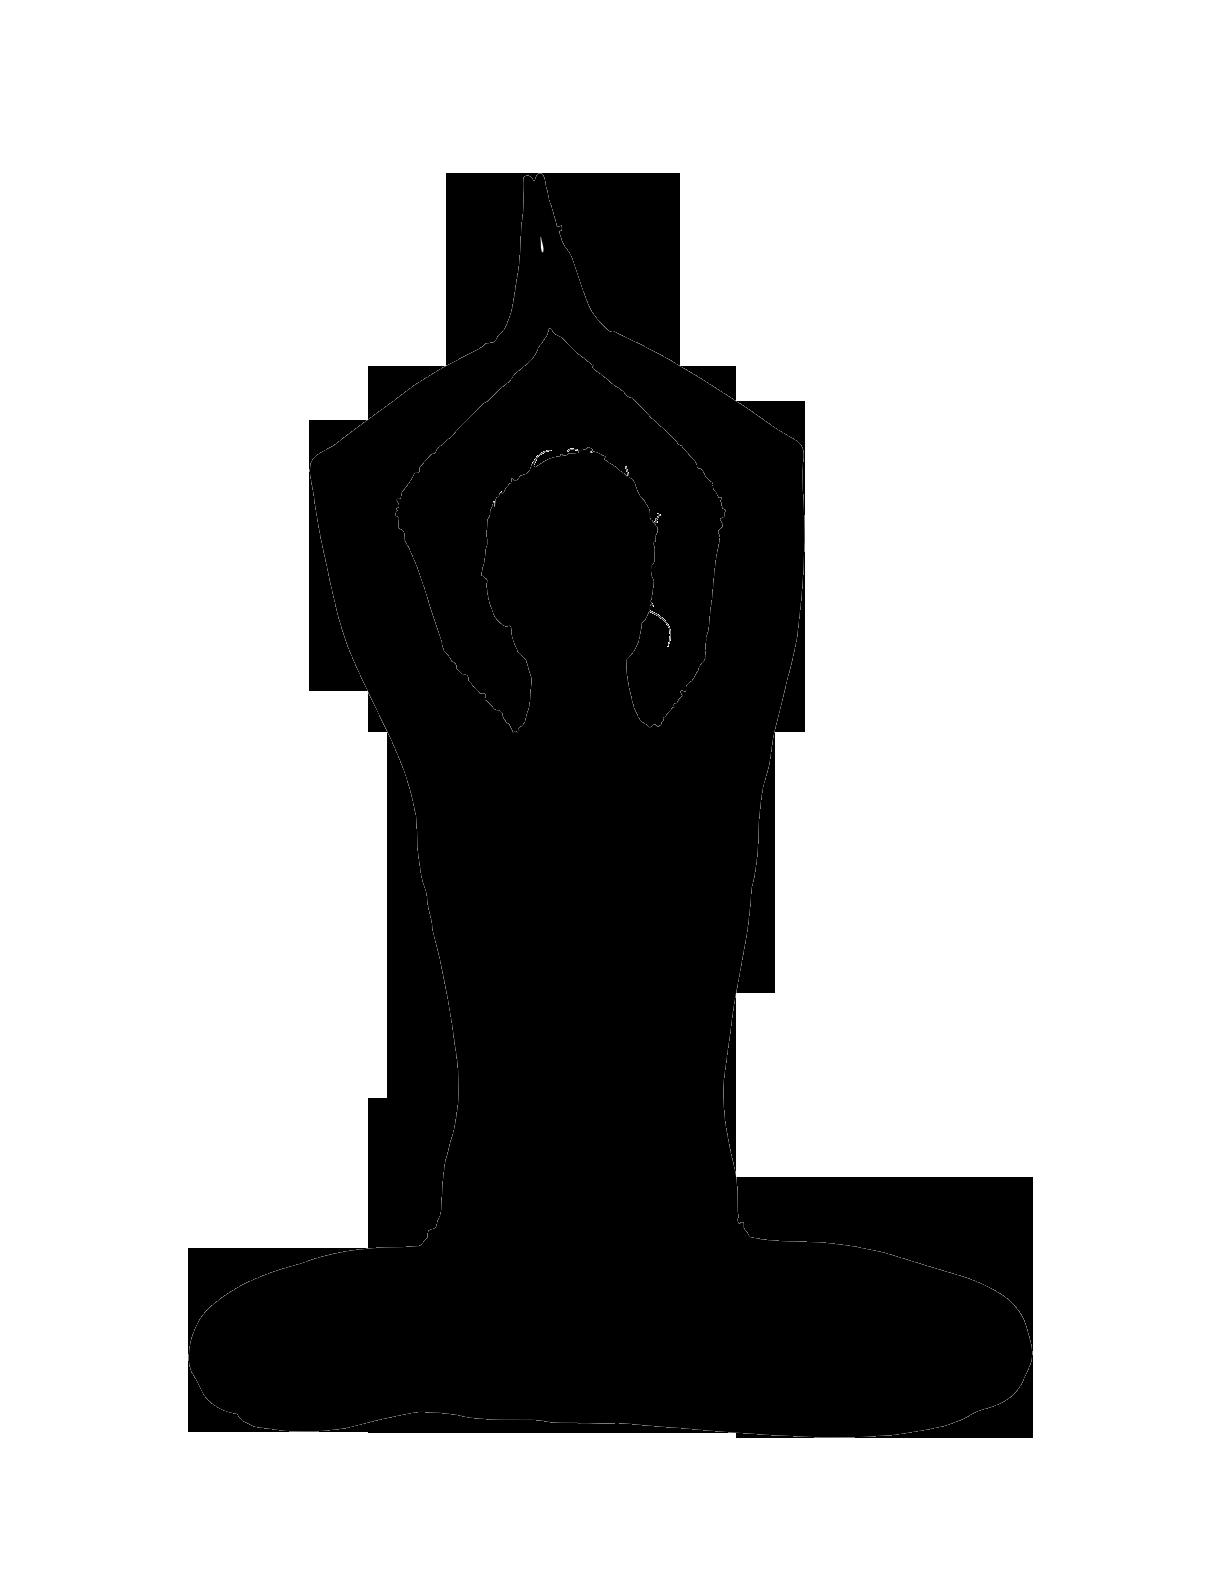 clip transparent download Silhouette inspiration pinterest silhouettes. Lady clipart yoga.